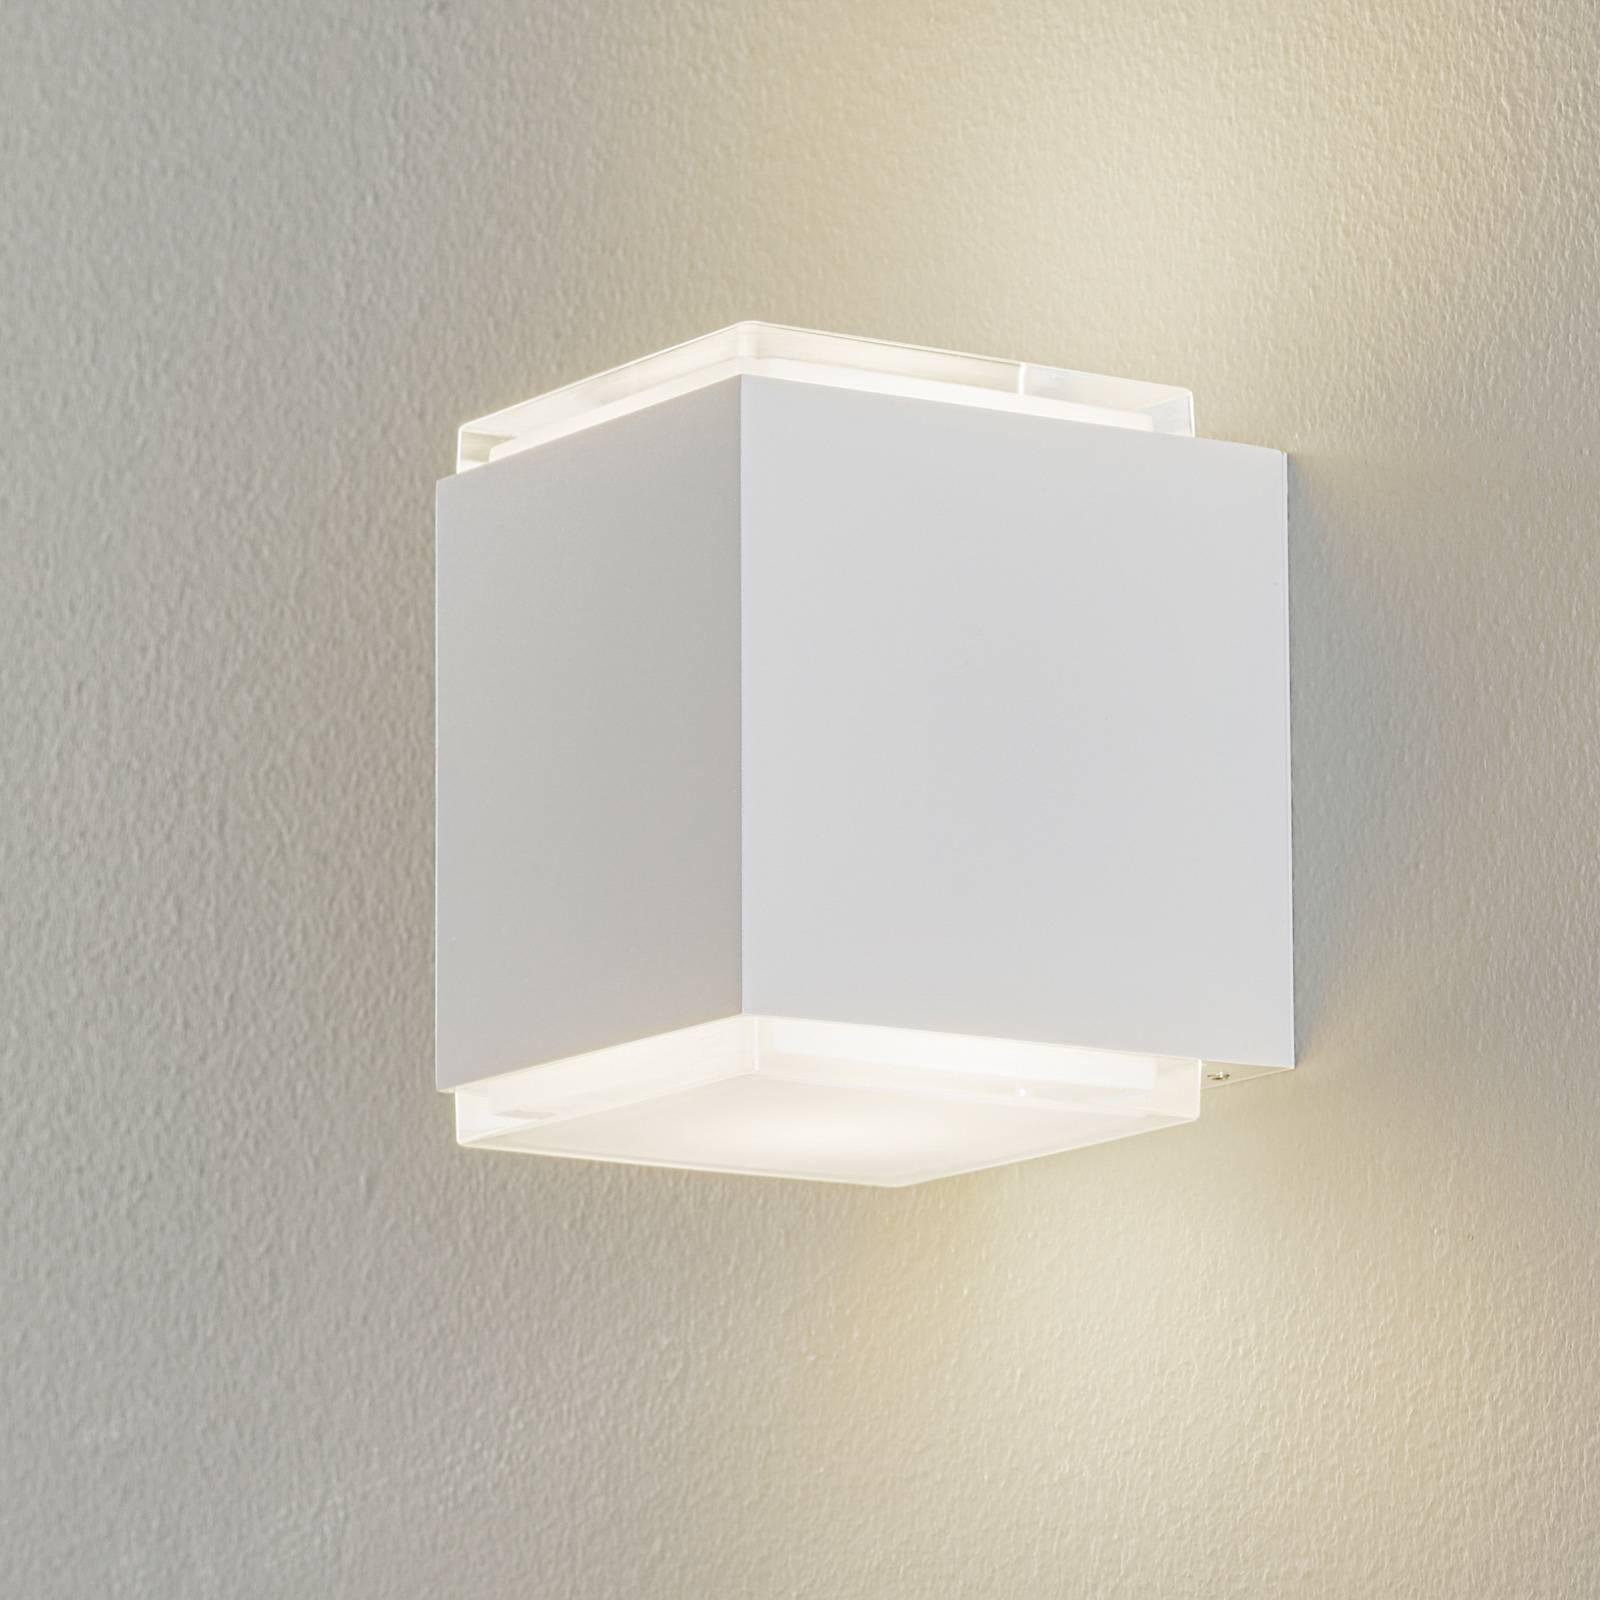 BEGA 50064 LED-seinälamppu 3000K 12cm valkoinen